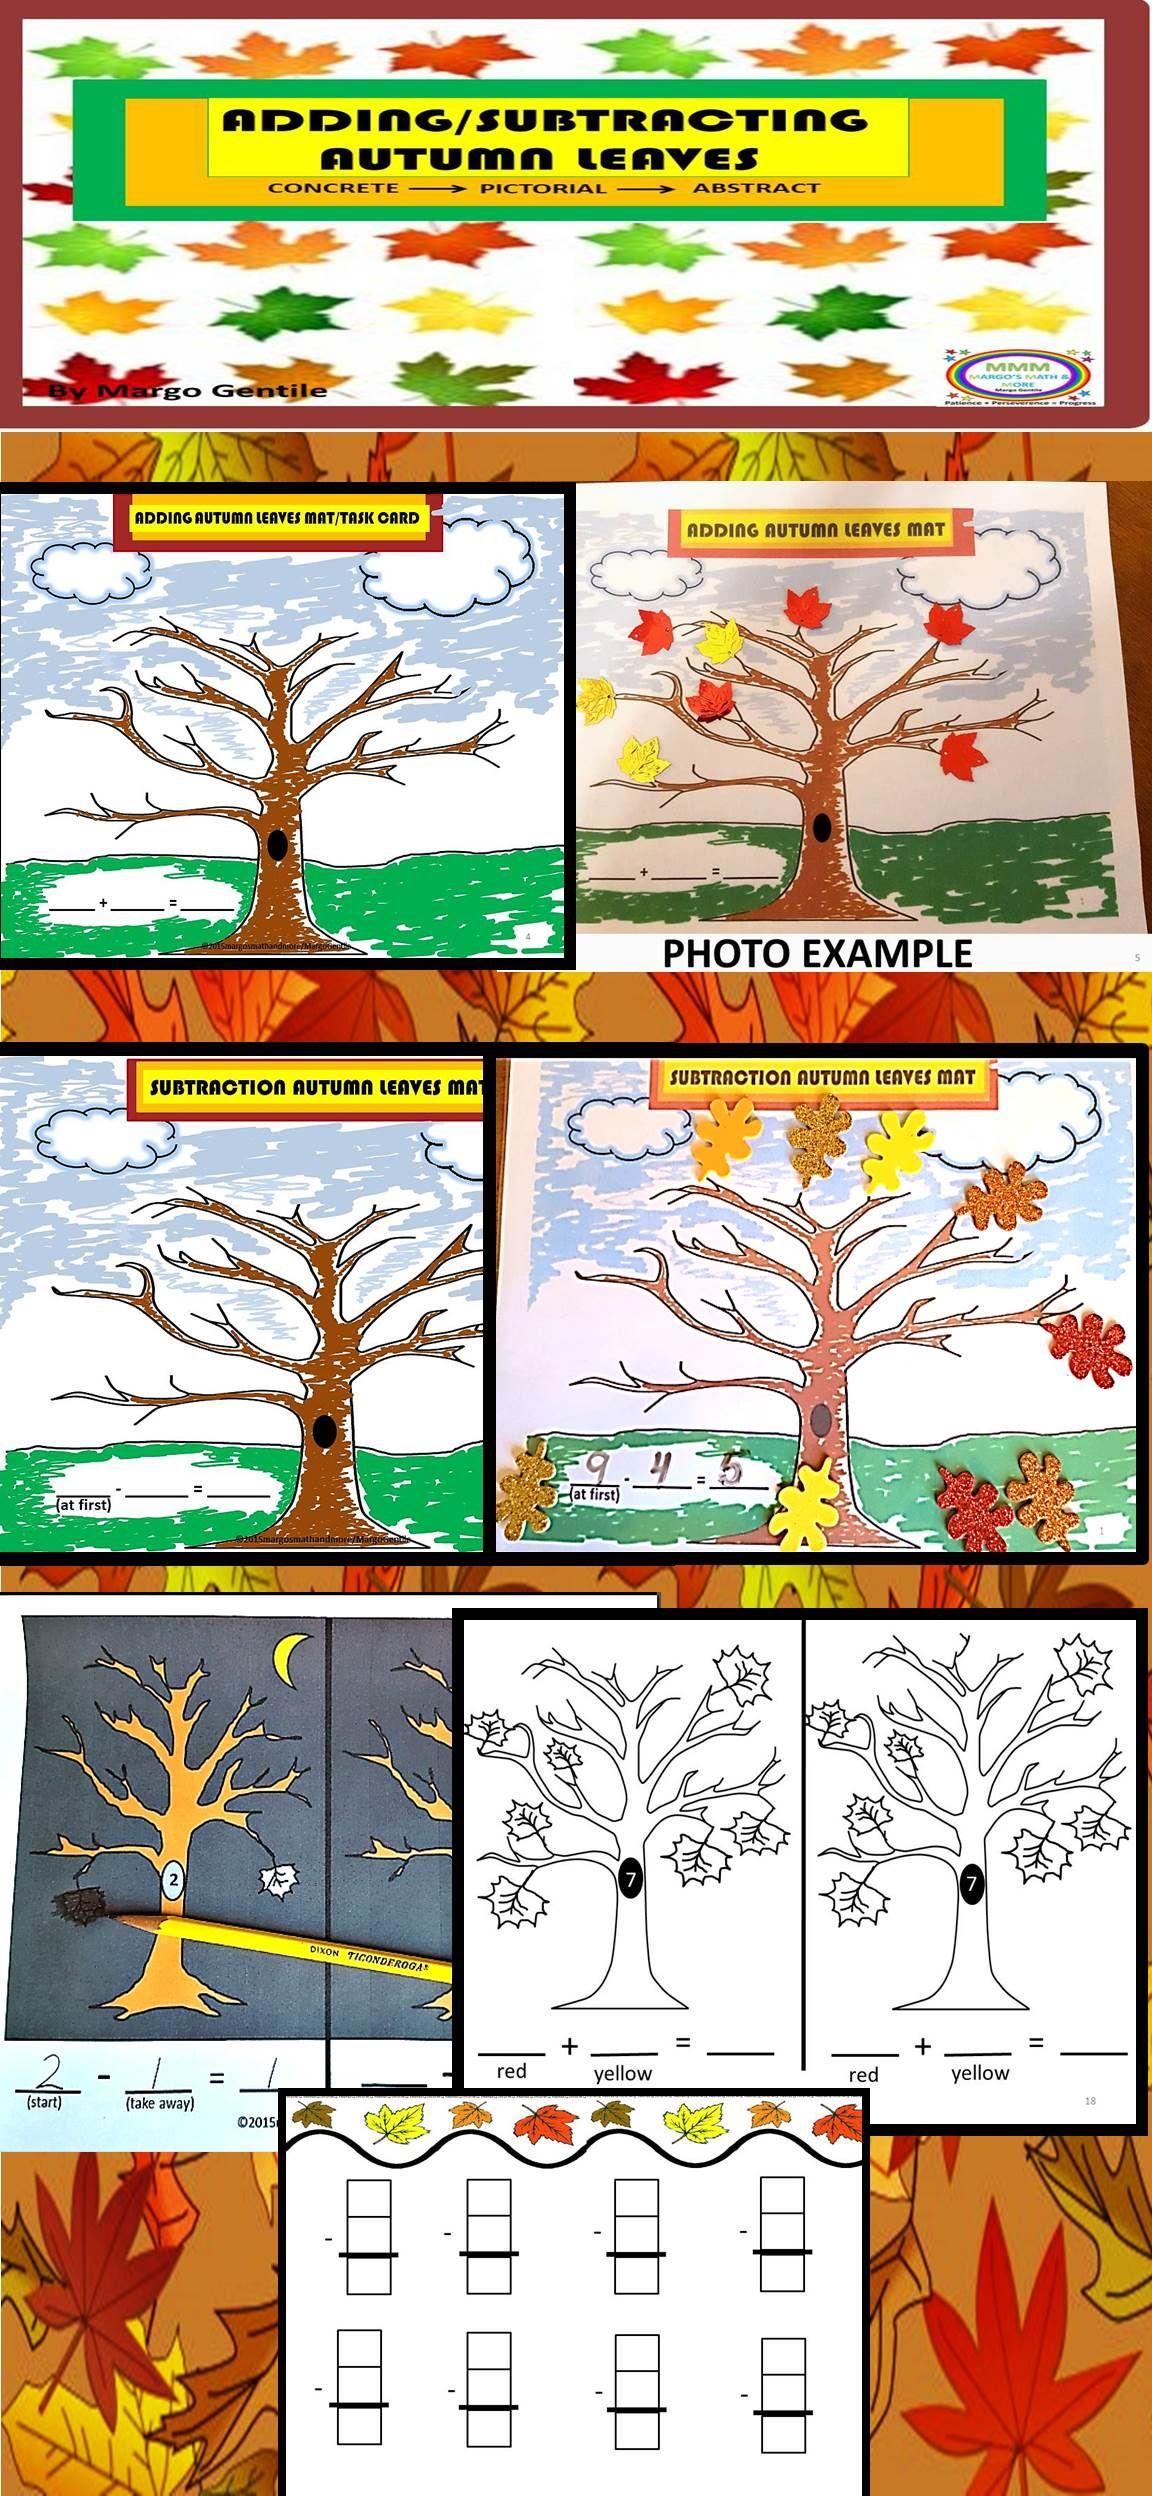 Adding Amp Subtracting Autumn Leaves